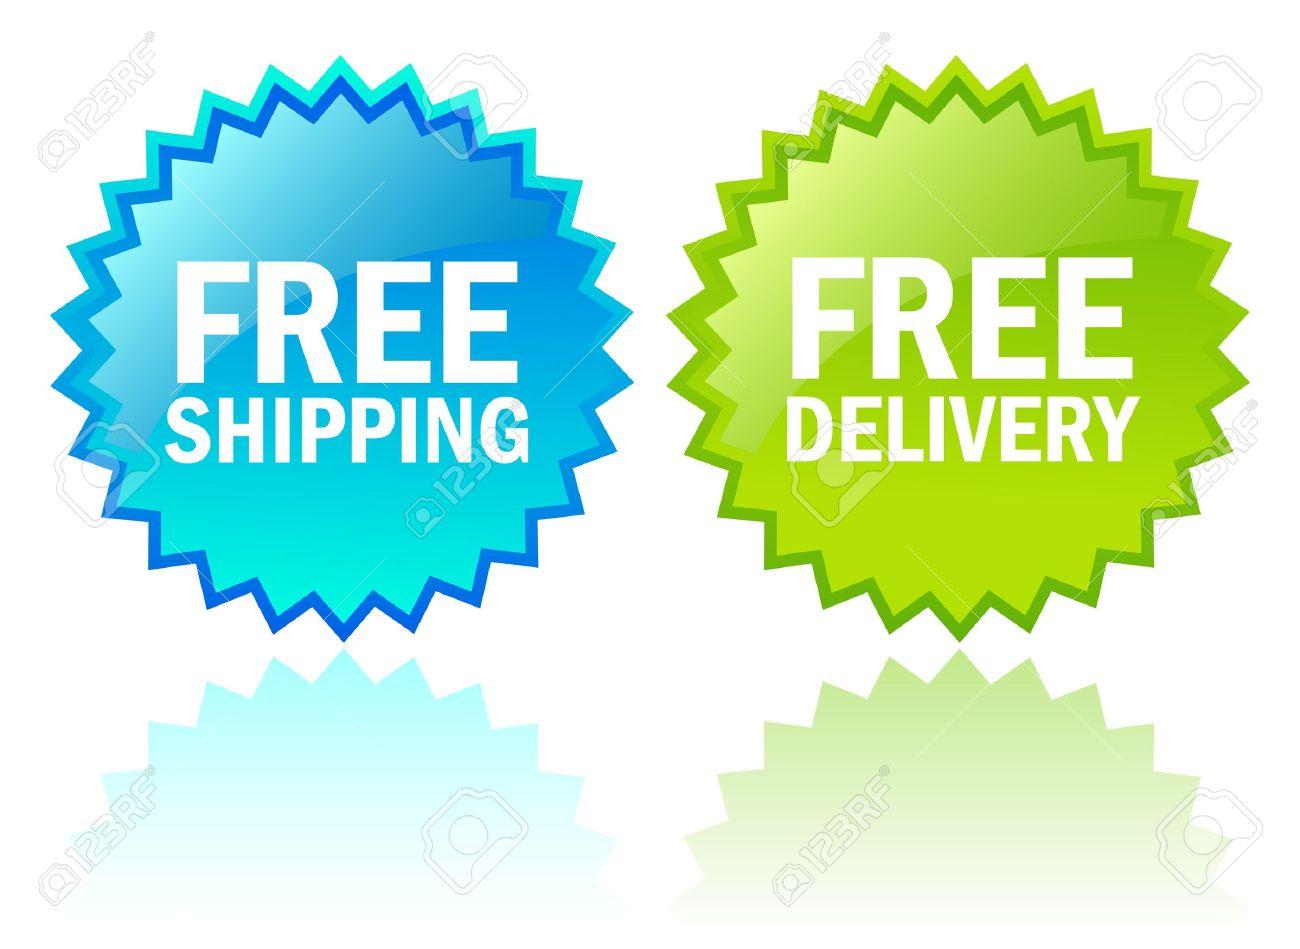 Vector free shipping icons Stock Vector - 14562975